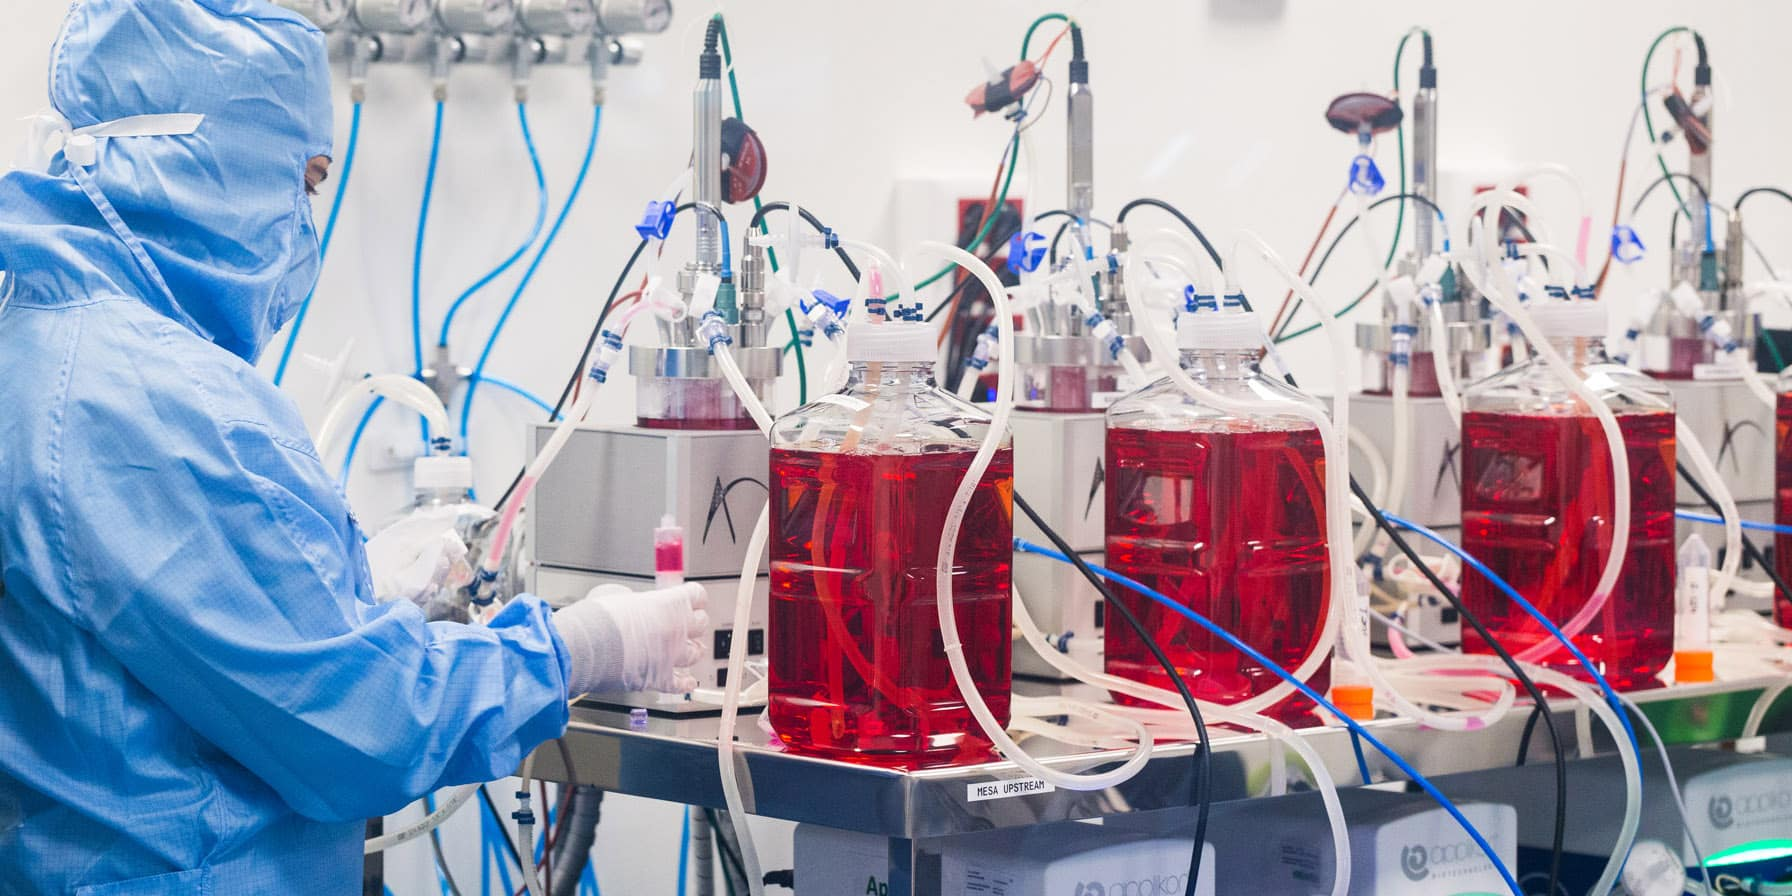 vivebiotech gurutz linazasoro biotecnologia terapias genicas vectores virales lentivirales